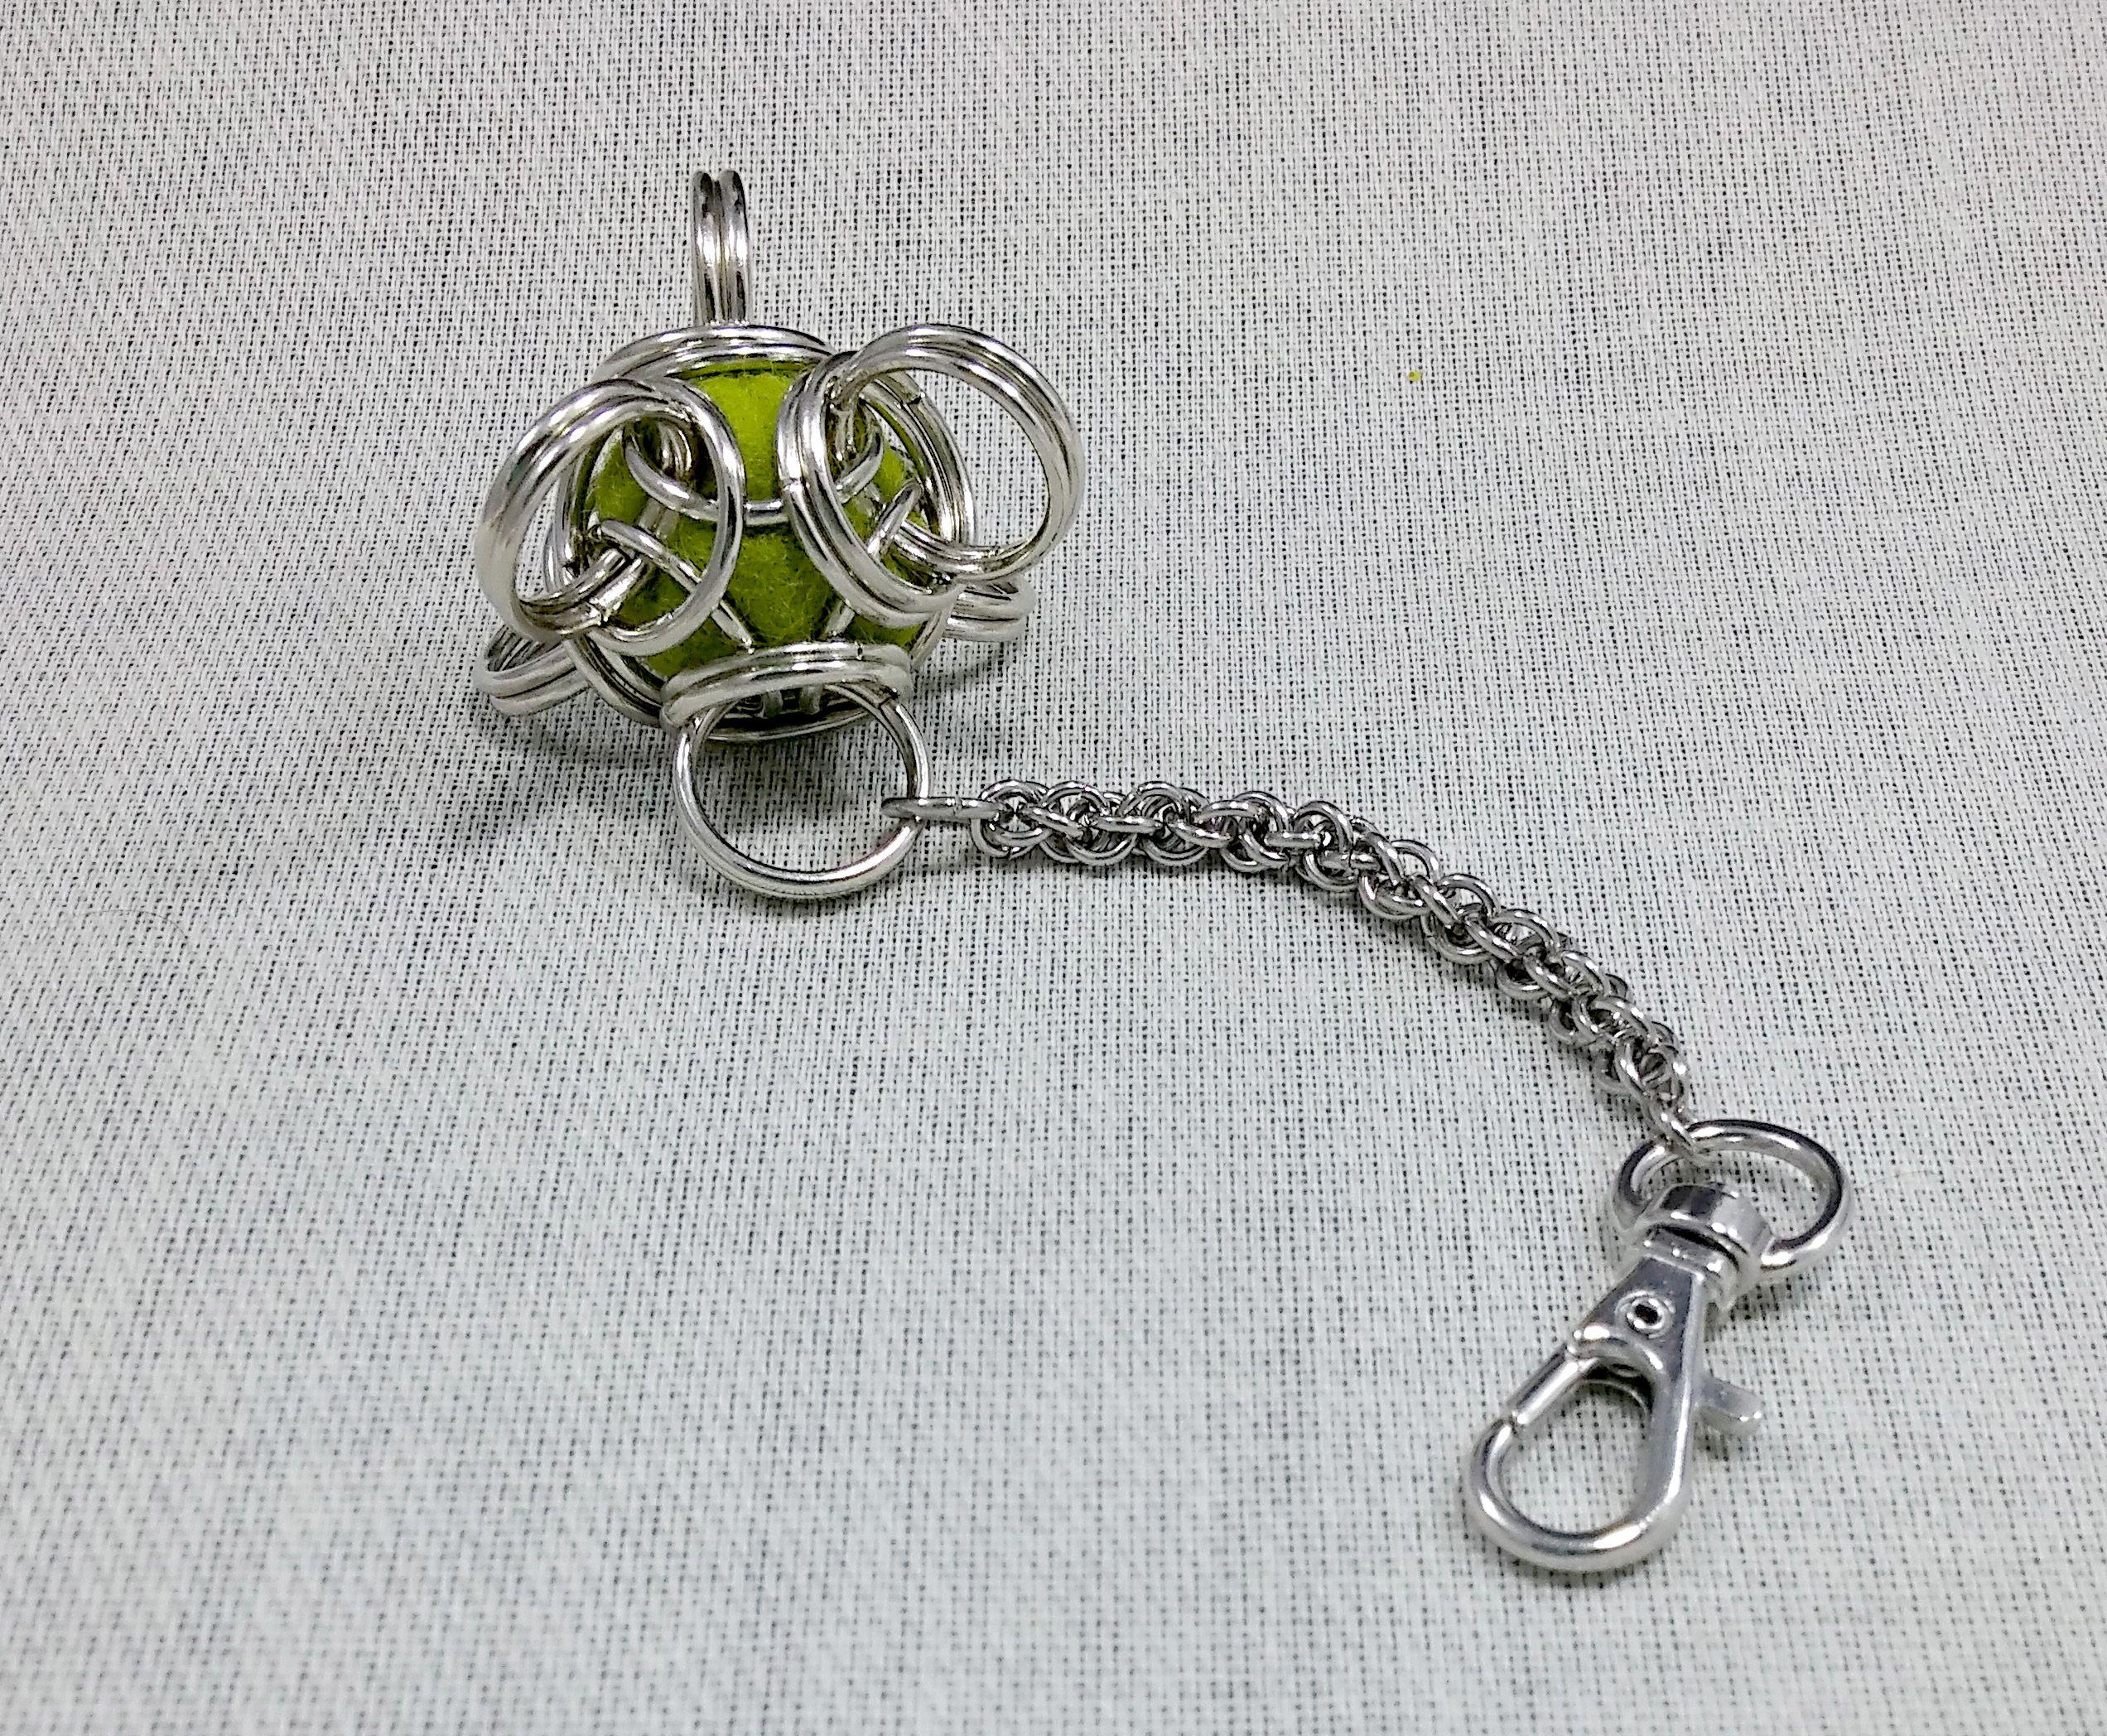 accessories green gift keychain unusual christmas keyfob